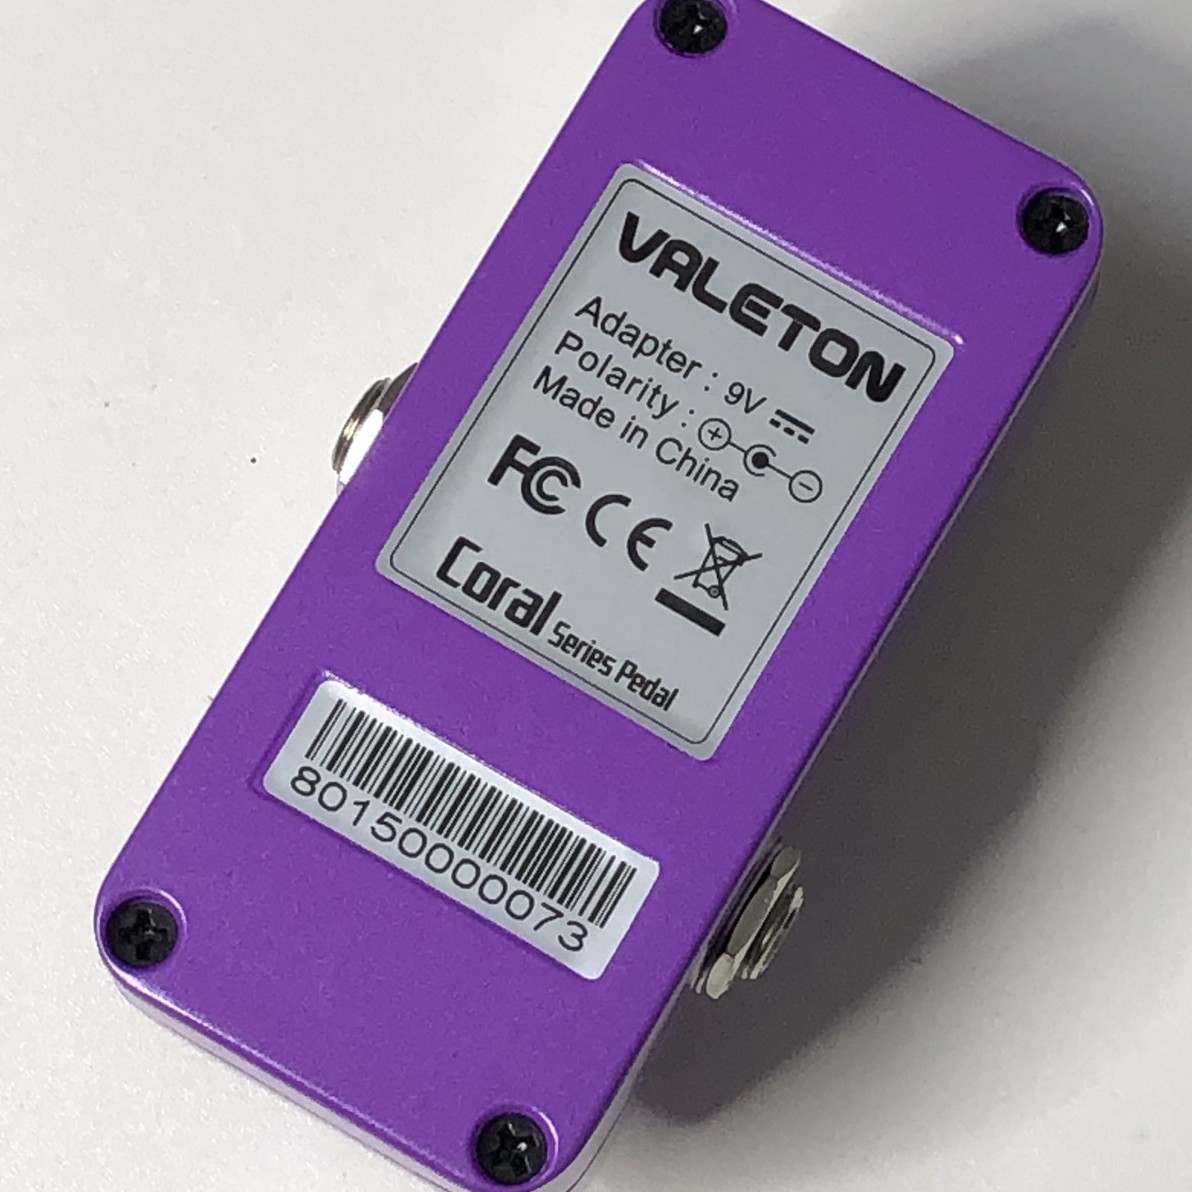 VALETON CORAL MOD モジュレーション・エフェクターの商品写真